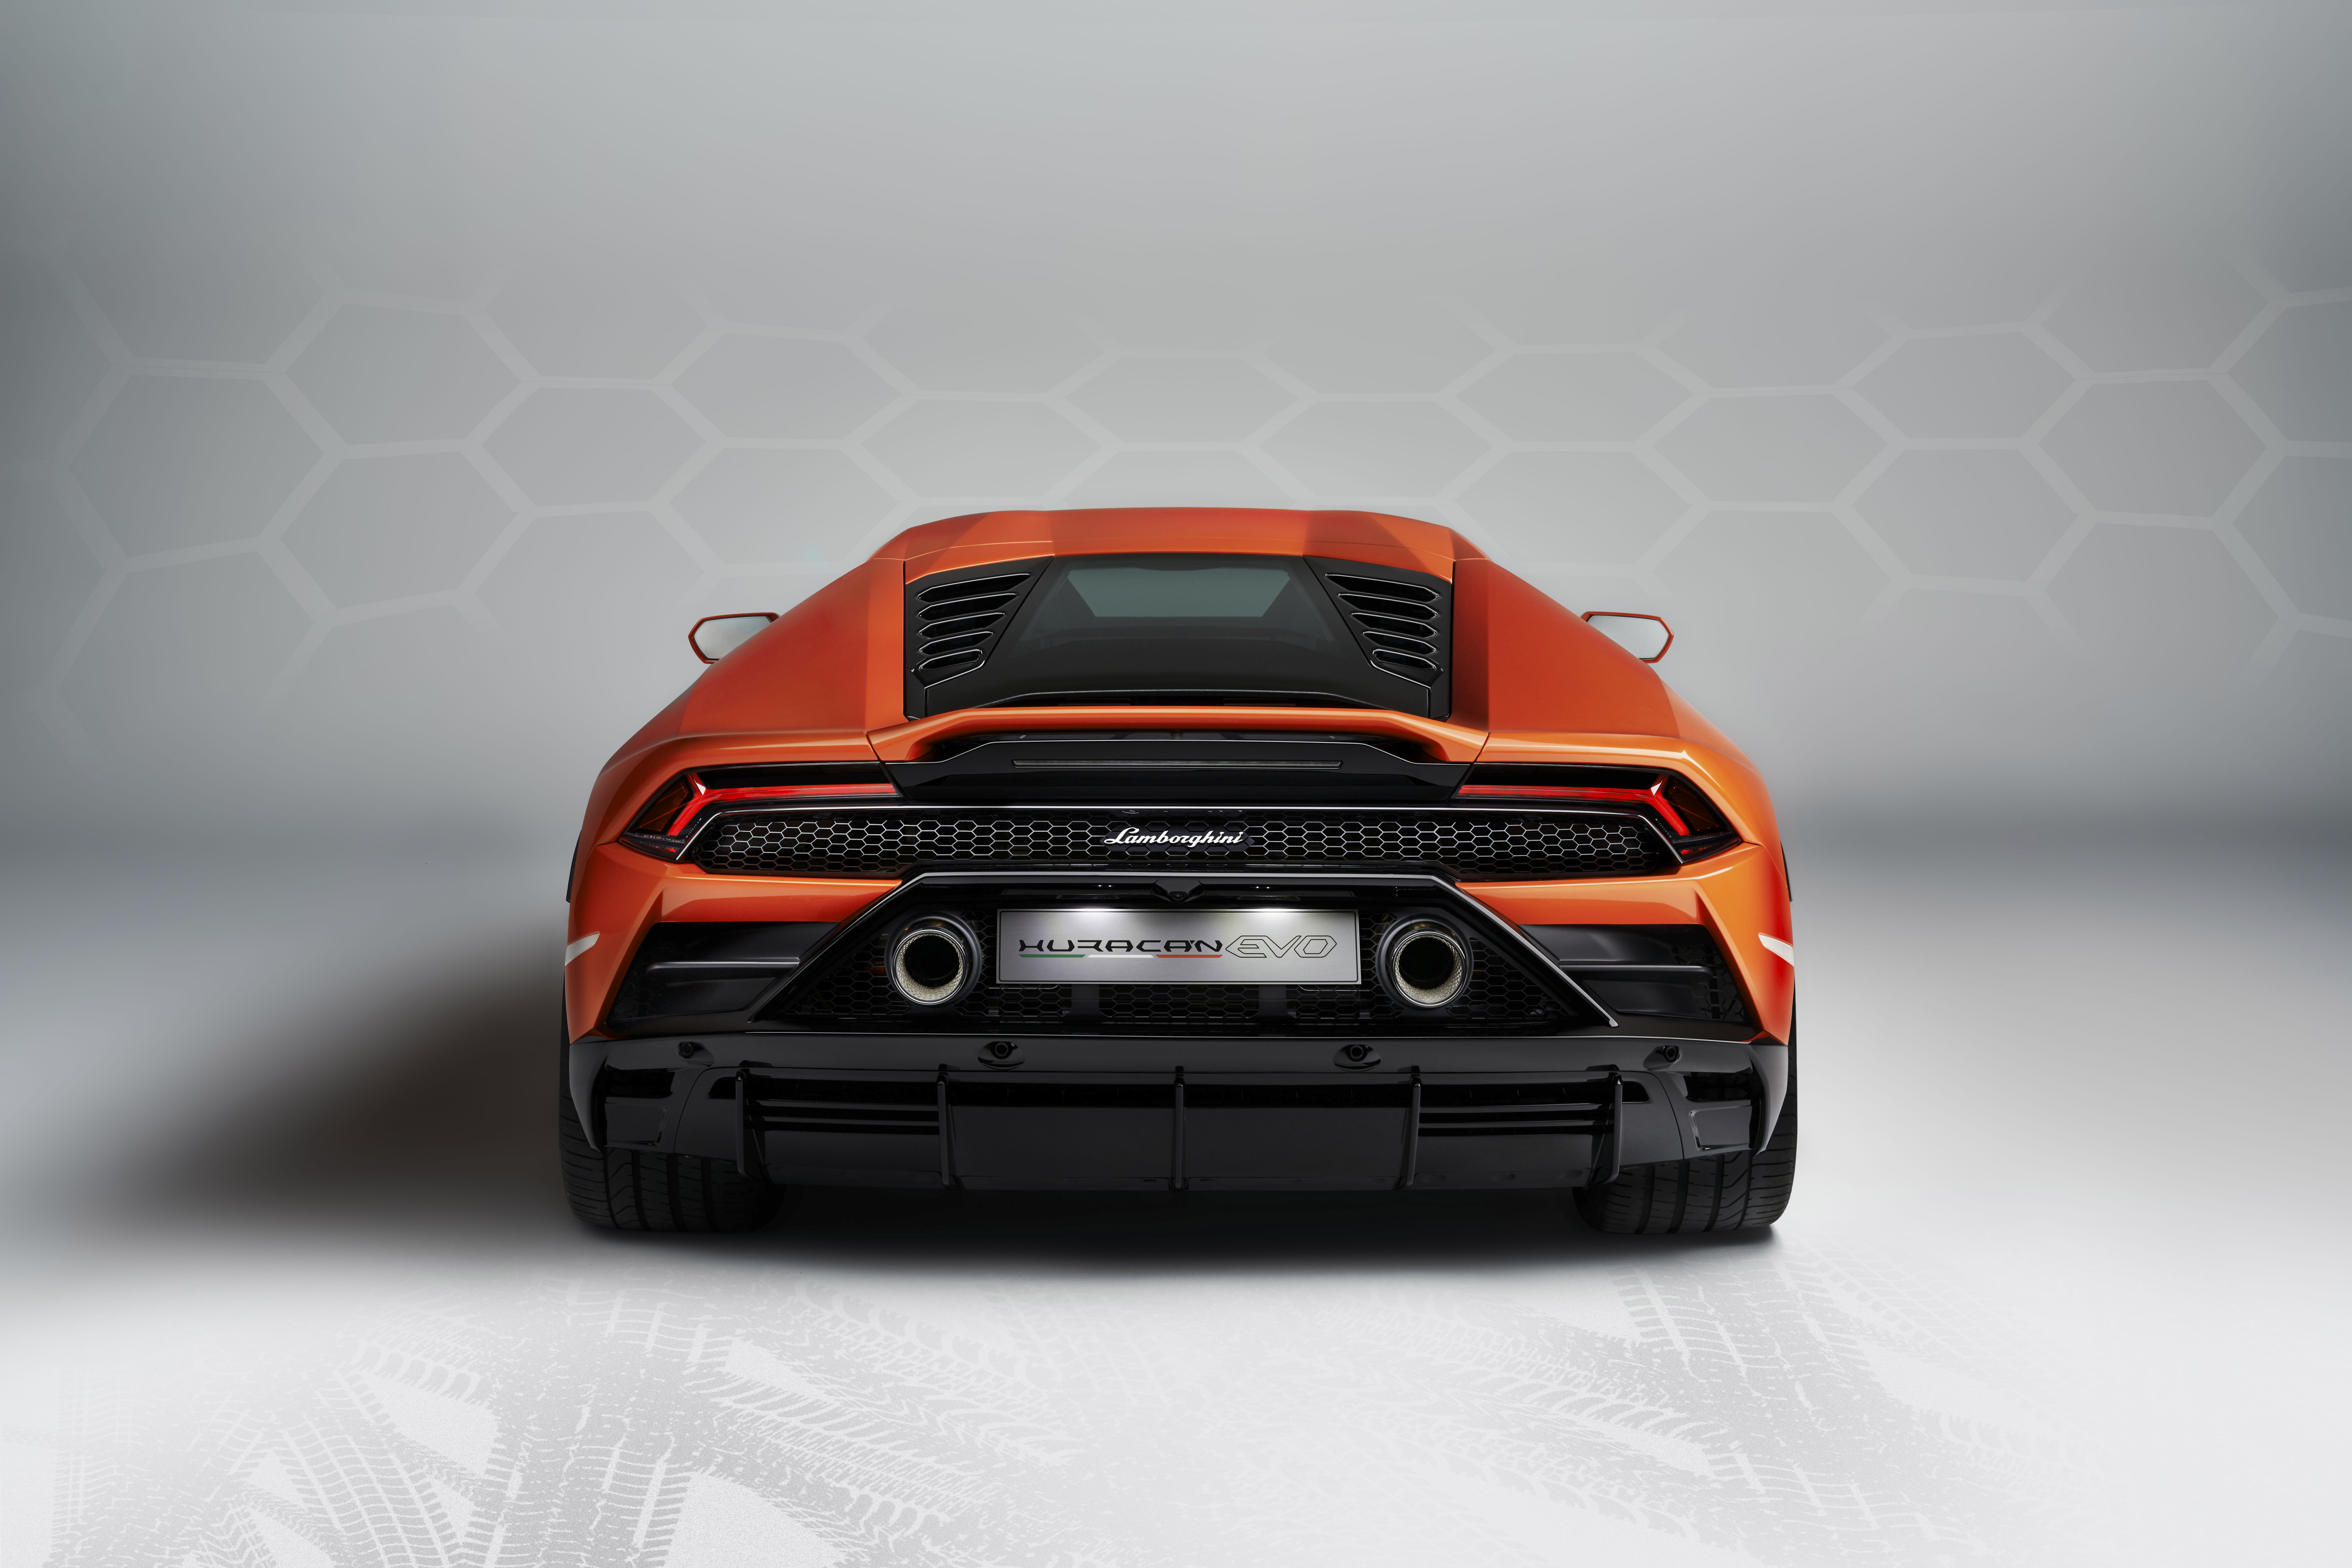 2020 Lamborghini Huracan Evo Wallpaper Lamborghini Cars Review